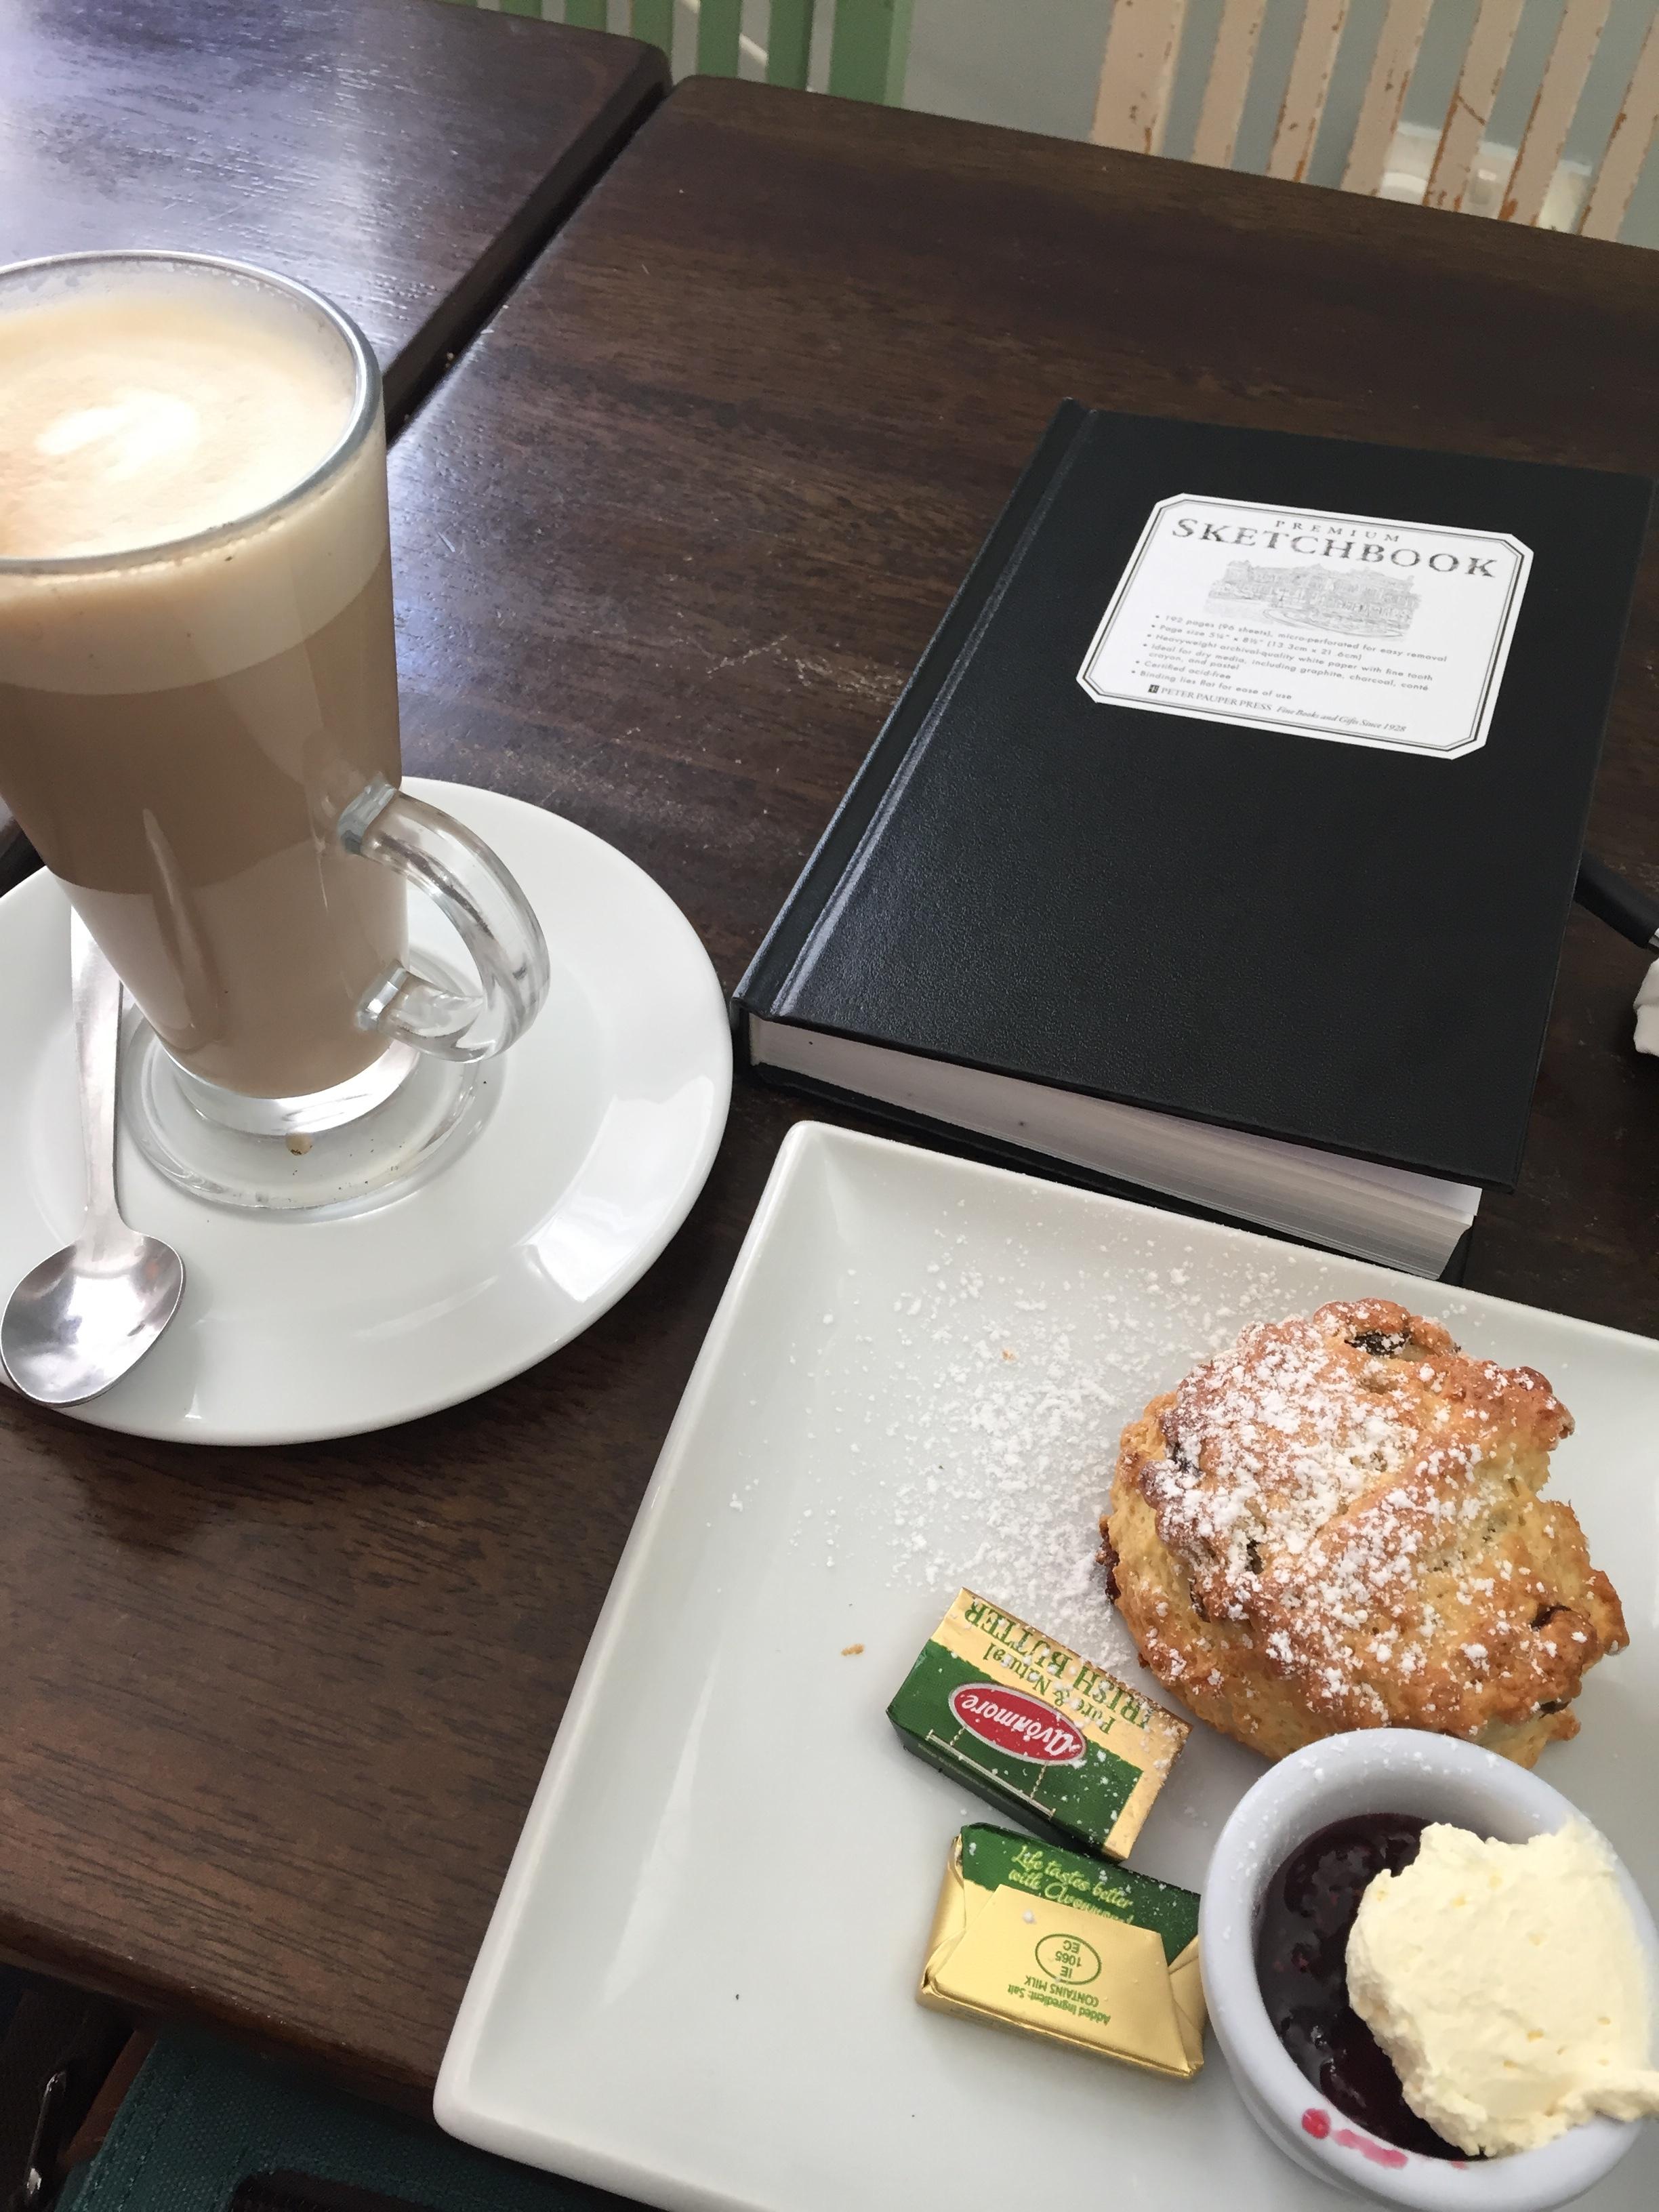 Latte, scone, sketchbook: happiness